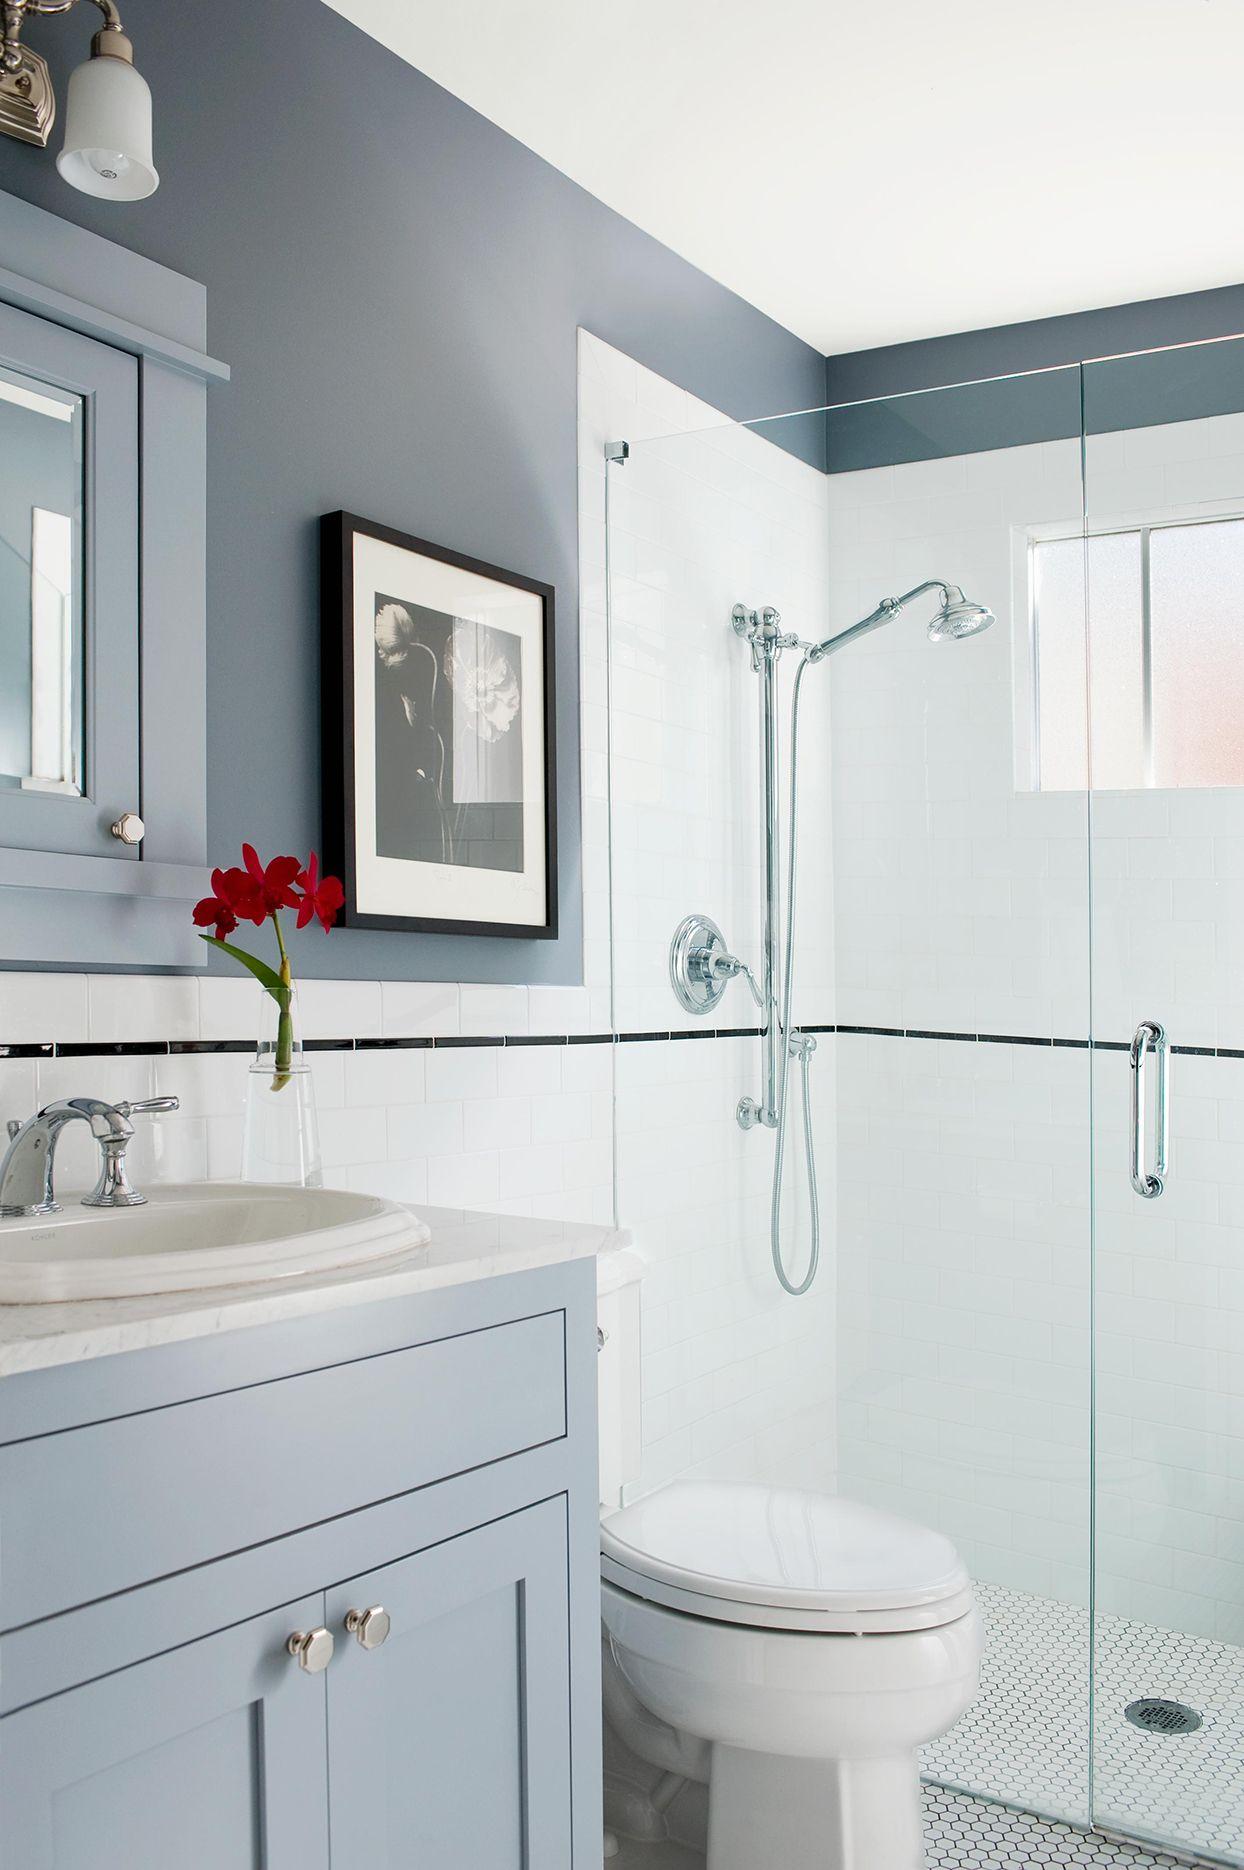 17 Money Saving Tips To Stretch Your Small Bathroom Budget